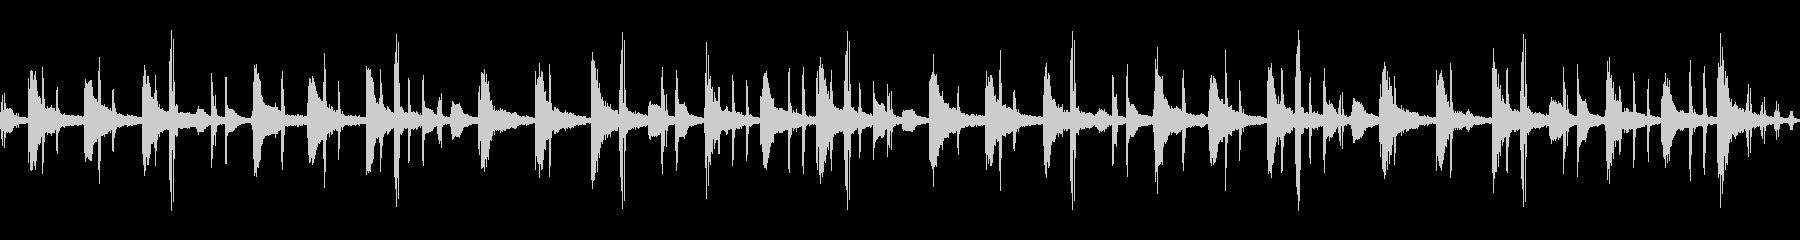 8-bar loop version pattern C's unreproduced waveform